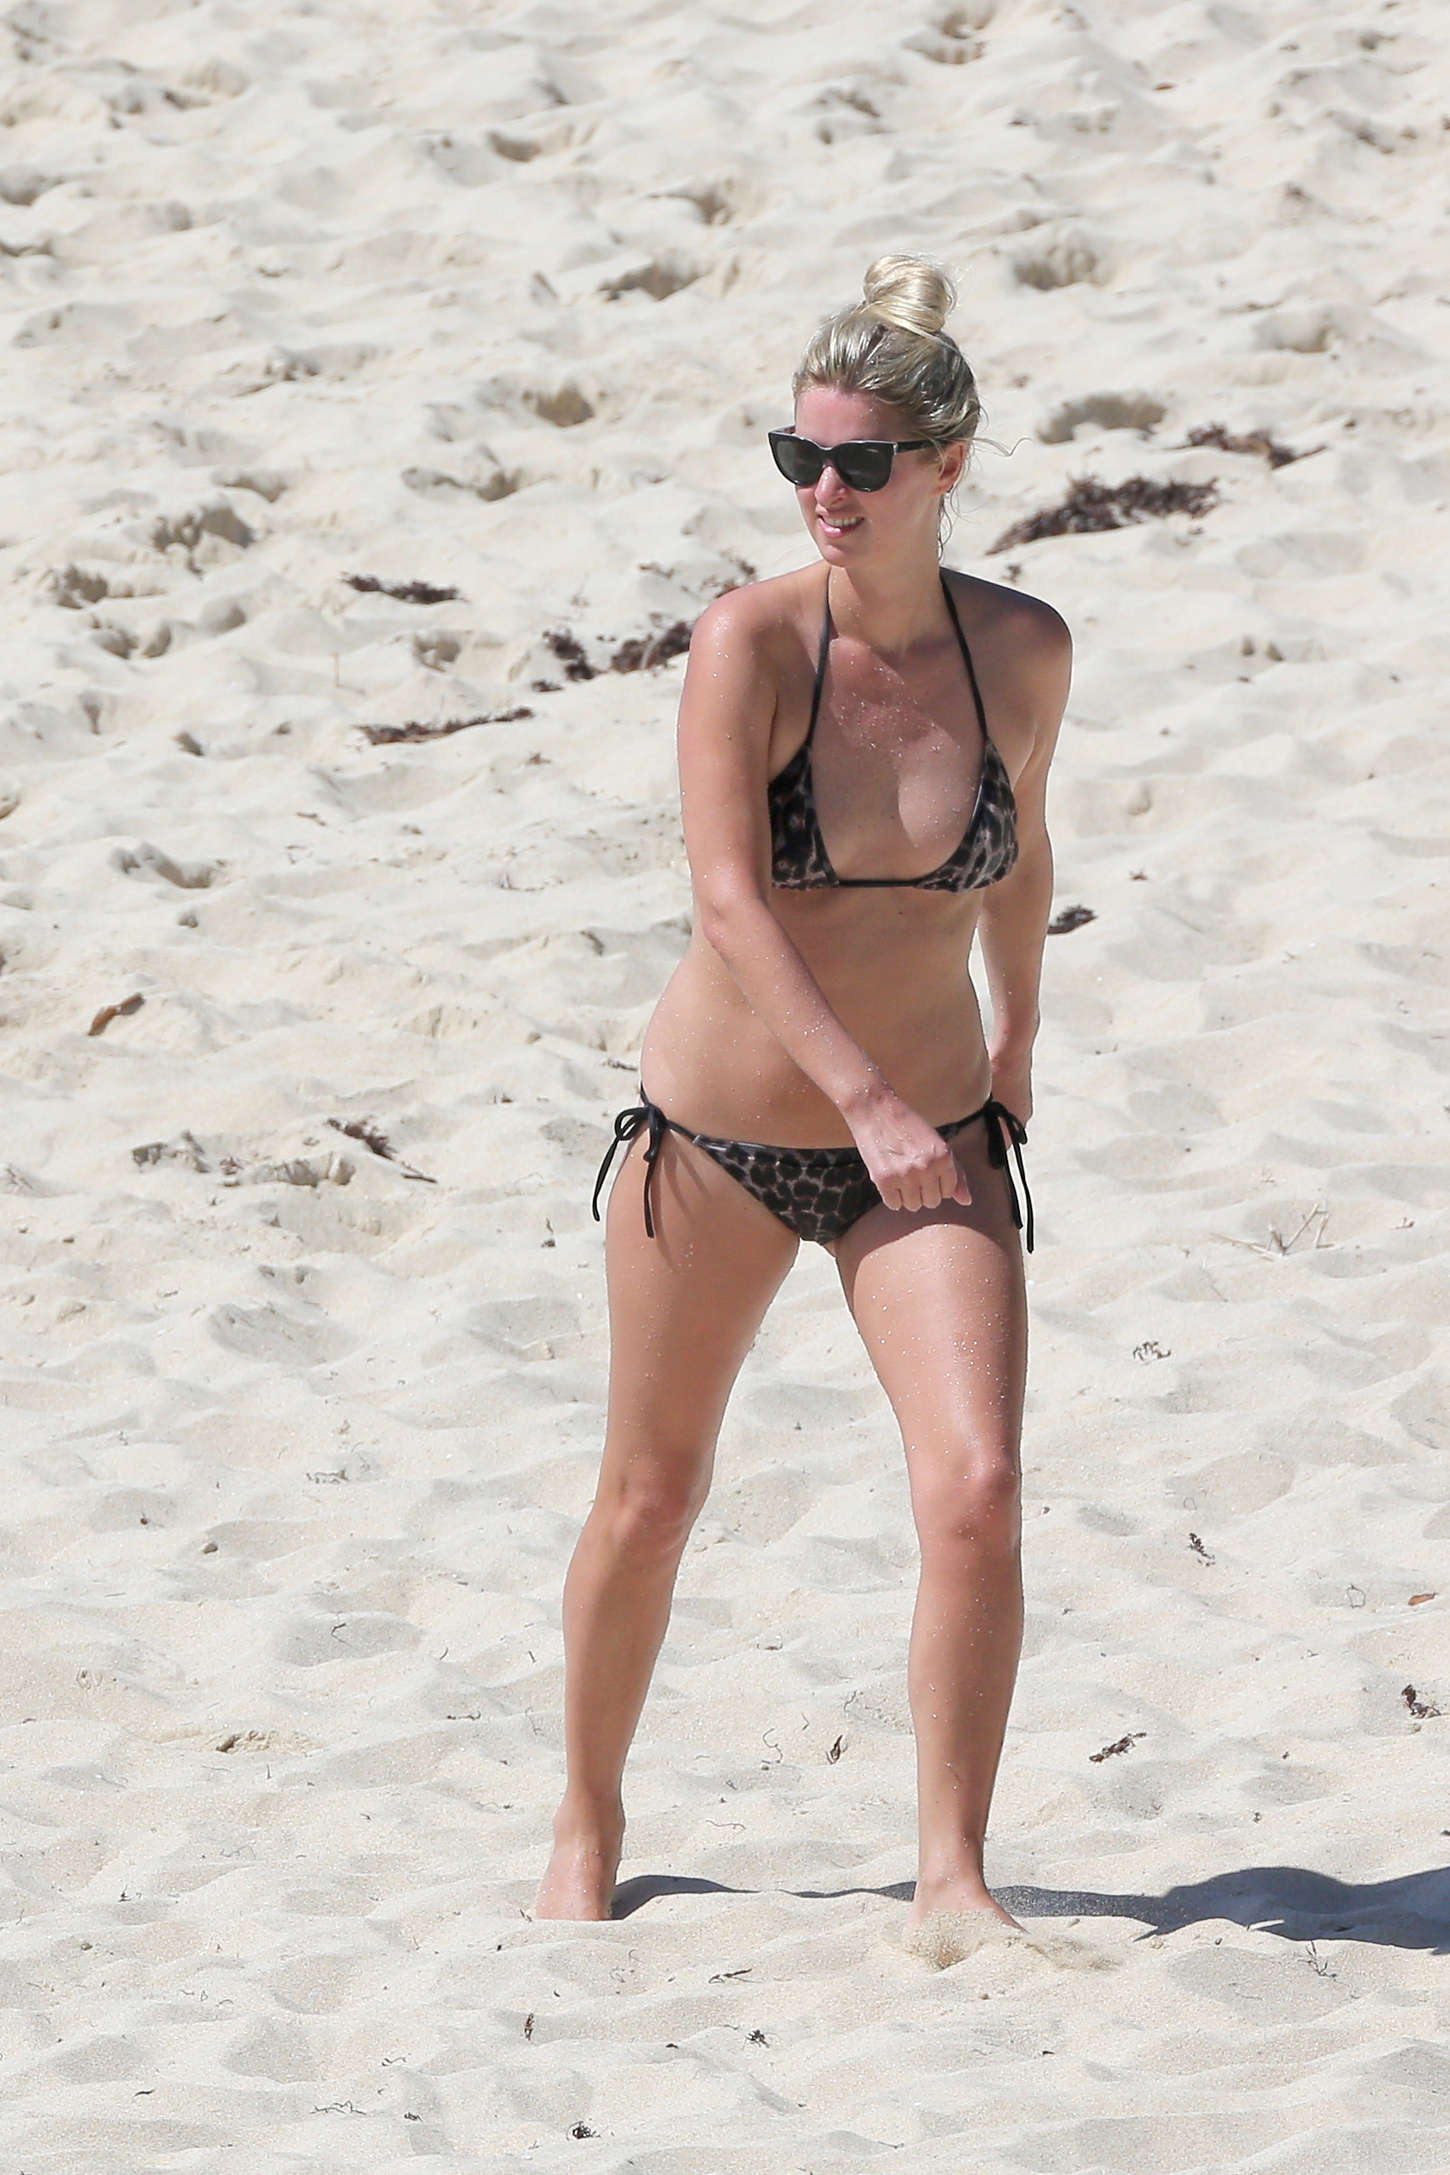 Nicky Hilton in Bikini on the beach in Caribbean